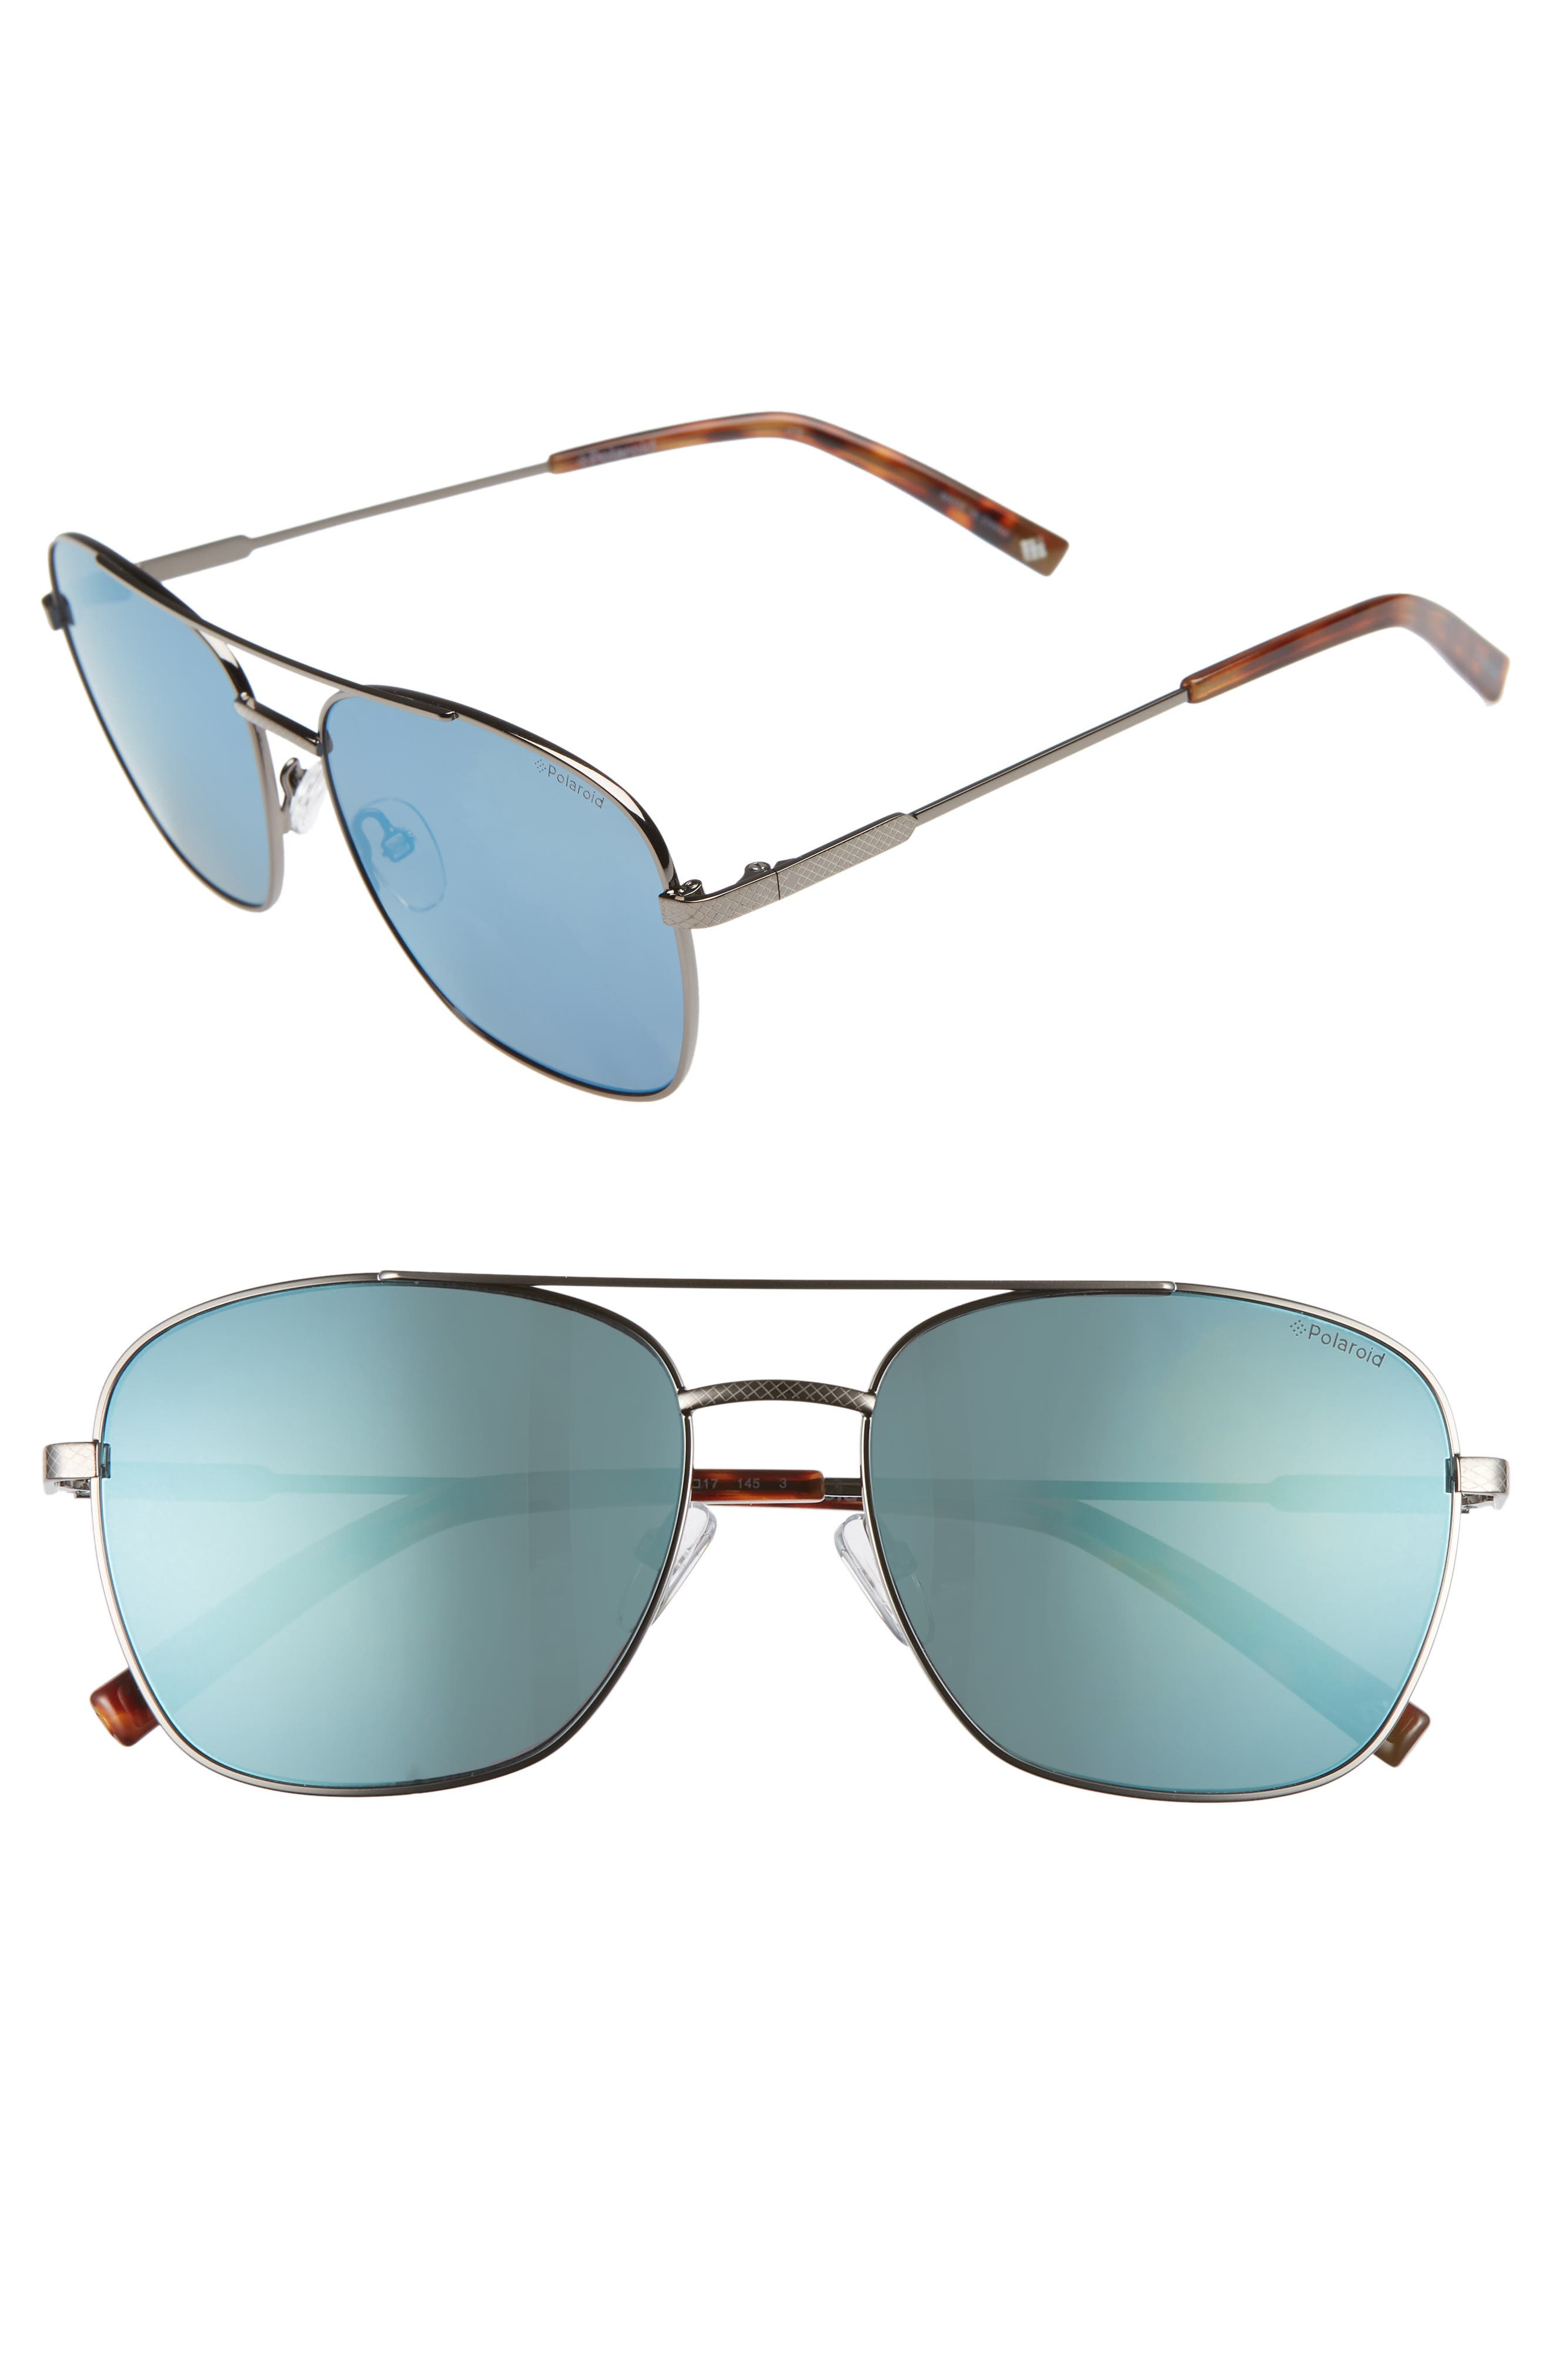 13ef1cbd68dc Polaroid Sunglasses for Women